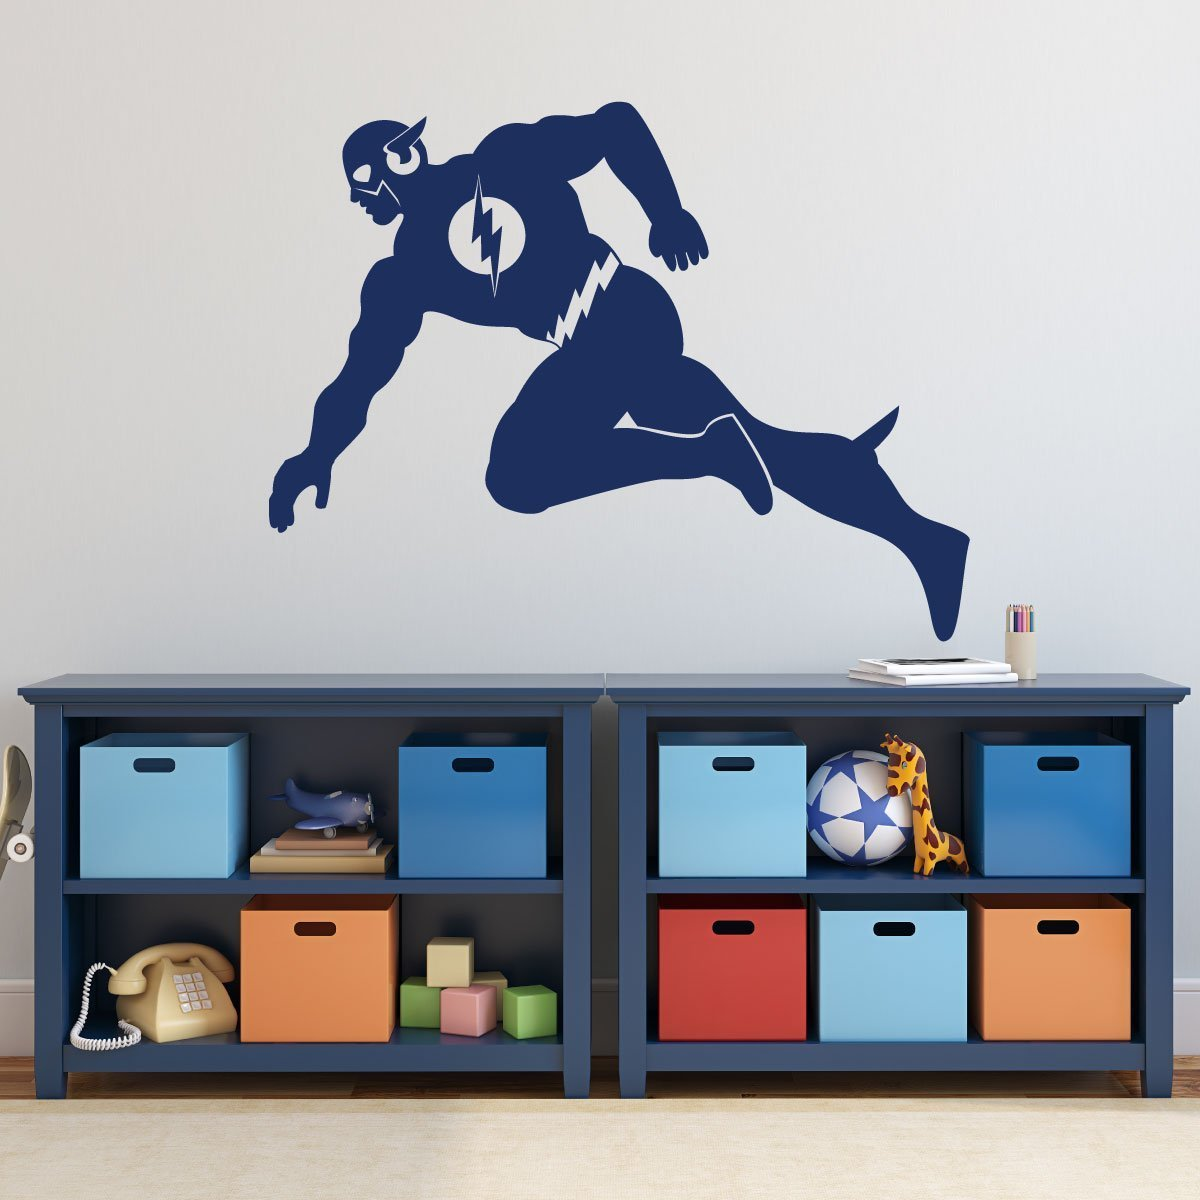 The Flash Superhero Decorations - Personalized DC Comics Figure Icon Vinyl  Wall Decor for Boy\'s Playroom, Bedroom, or Gameroom - Baby Nursery Design